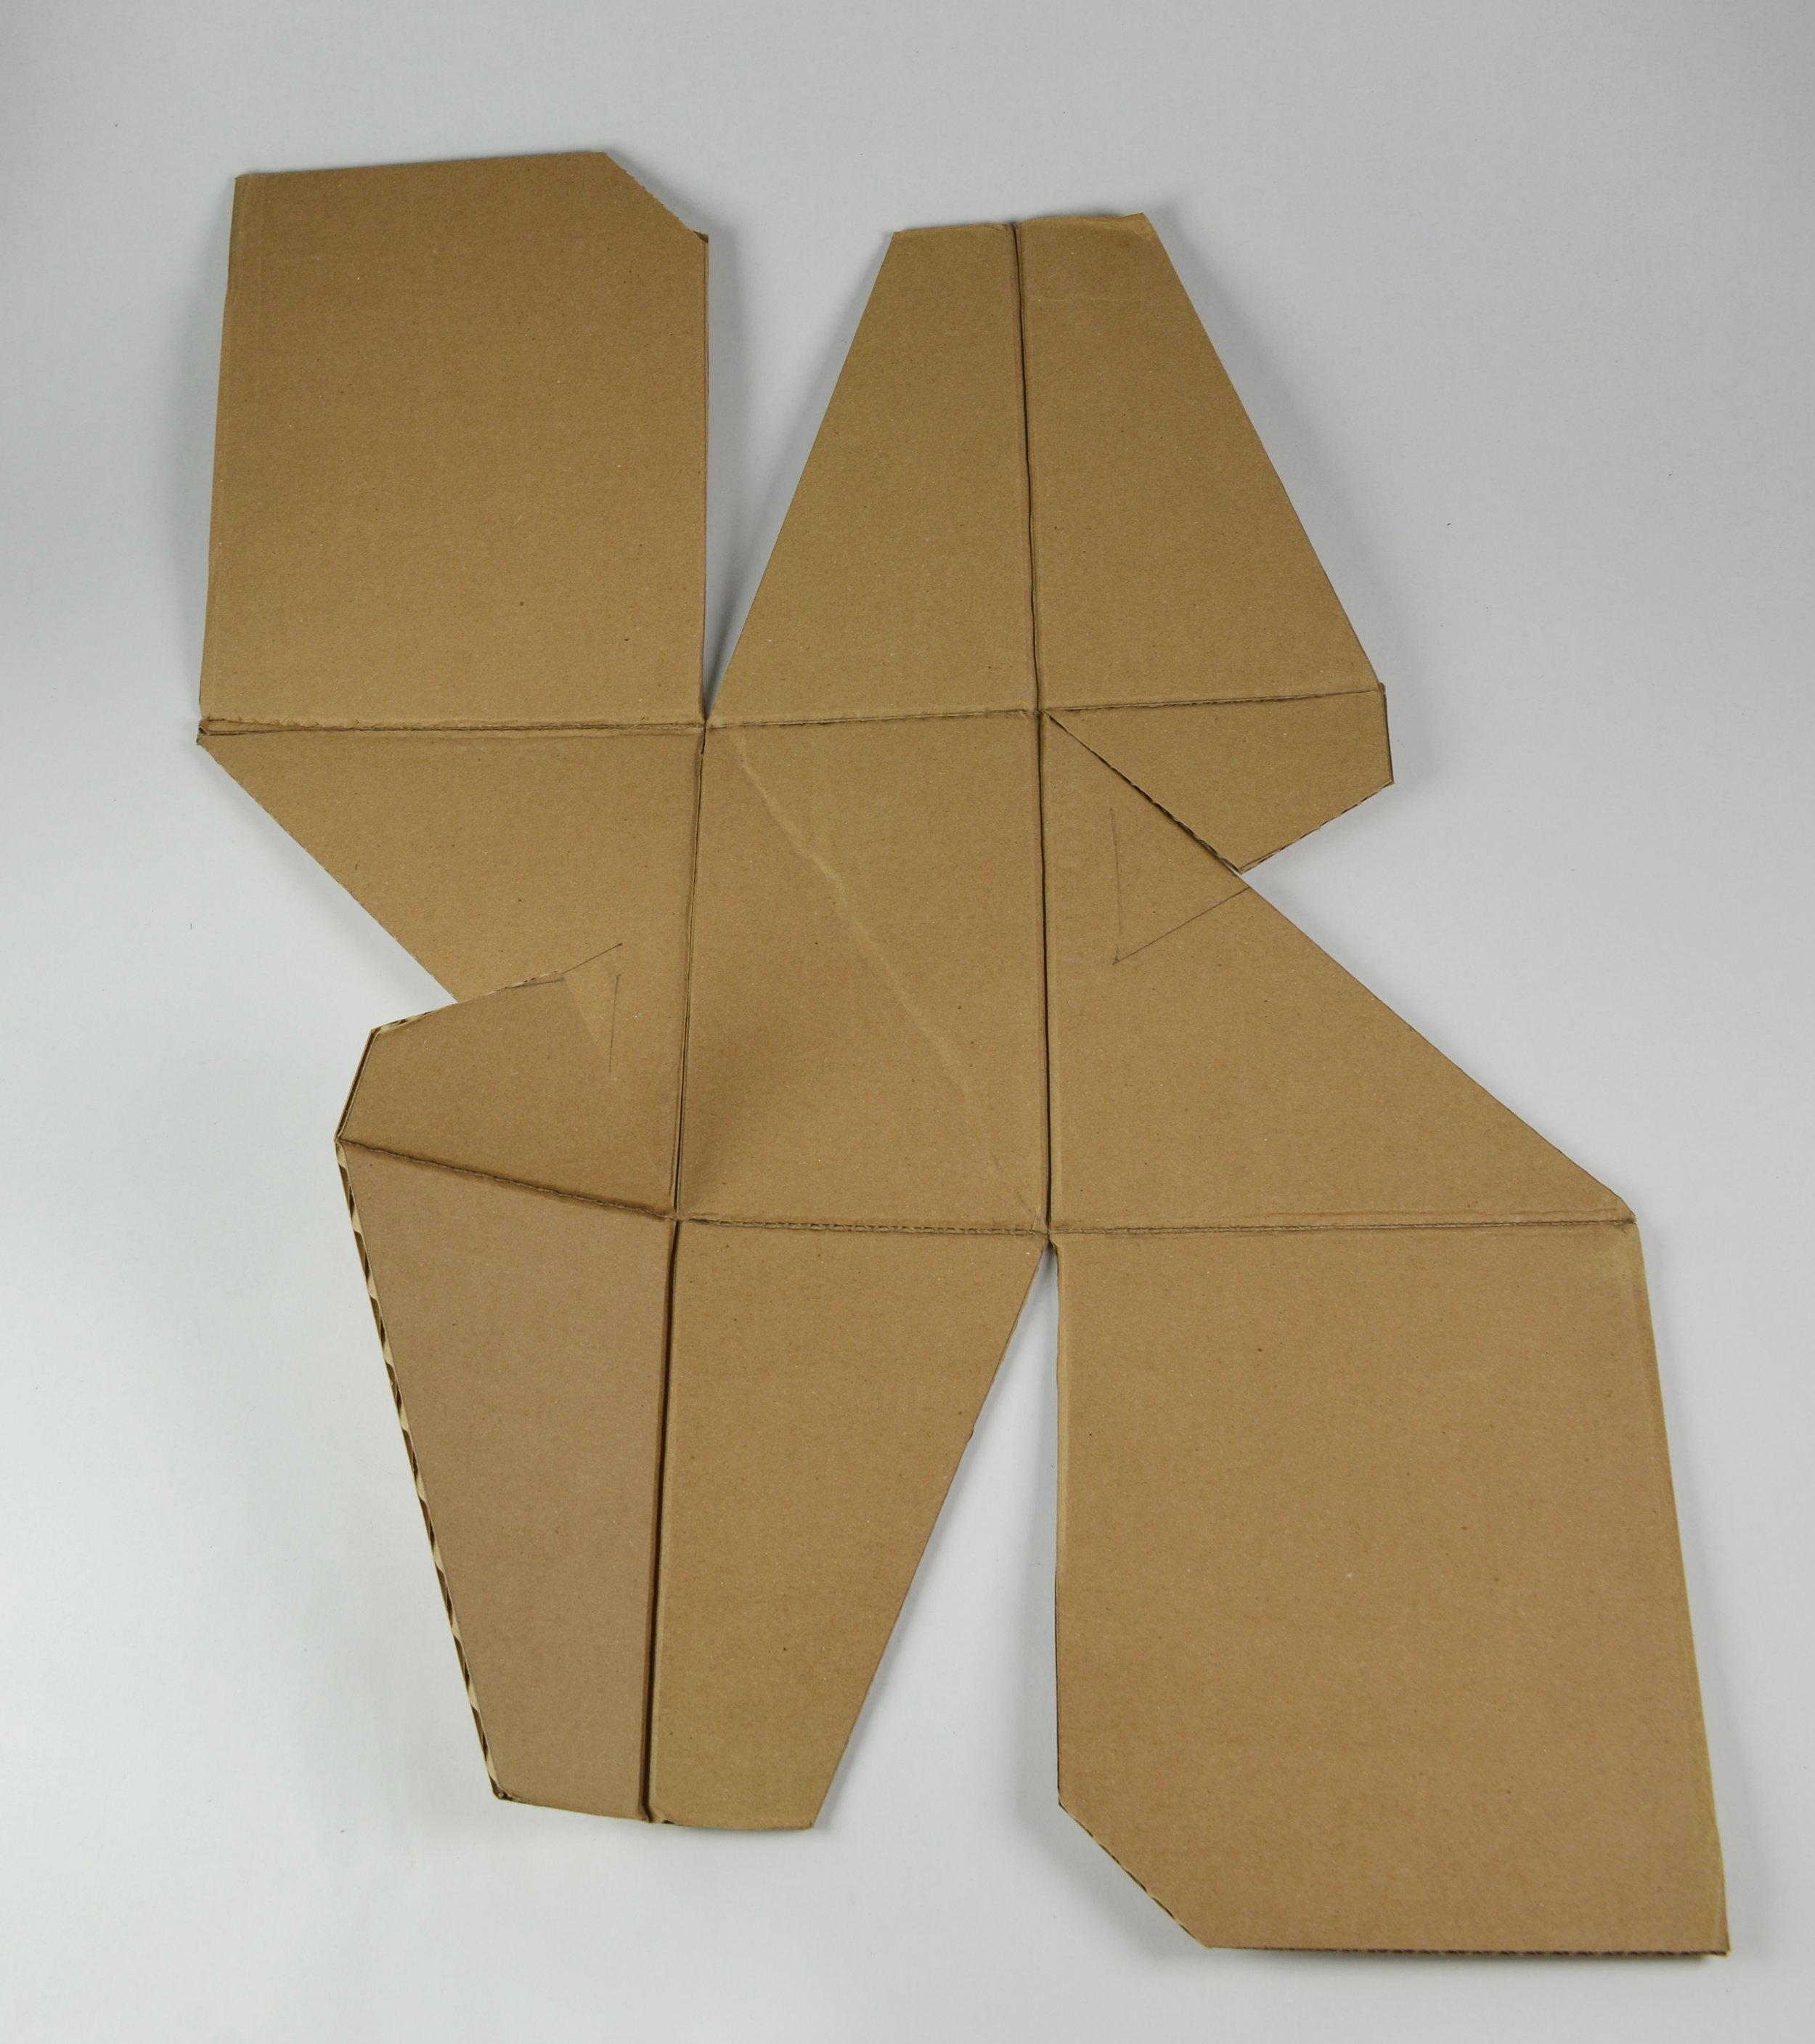 Cardboard Stool Full-Scale Prototype (2016)